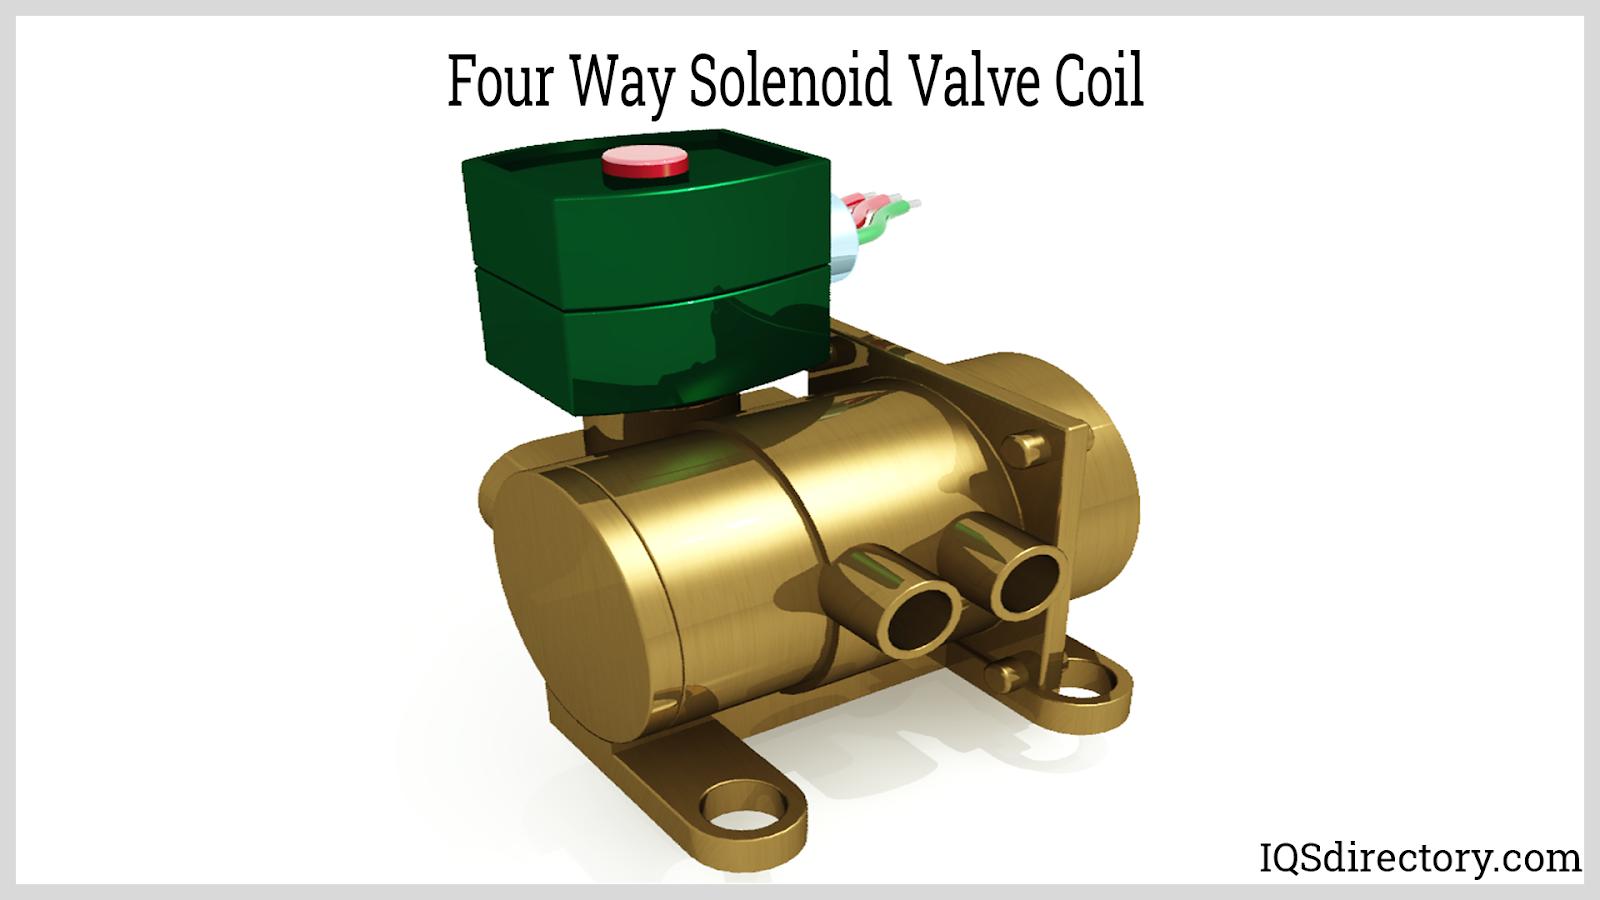 Four Way Solenoid Valve Coil